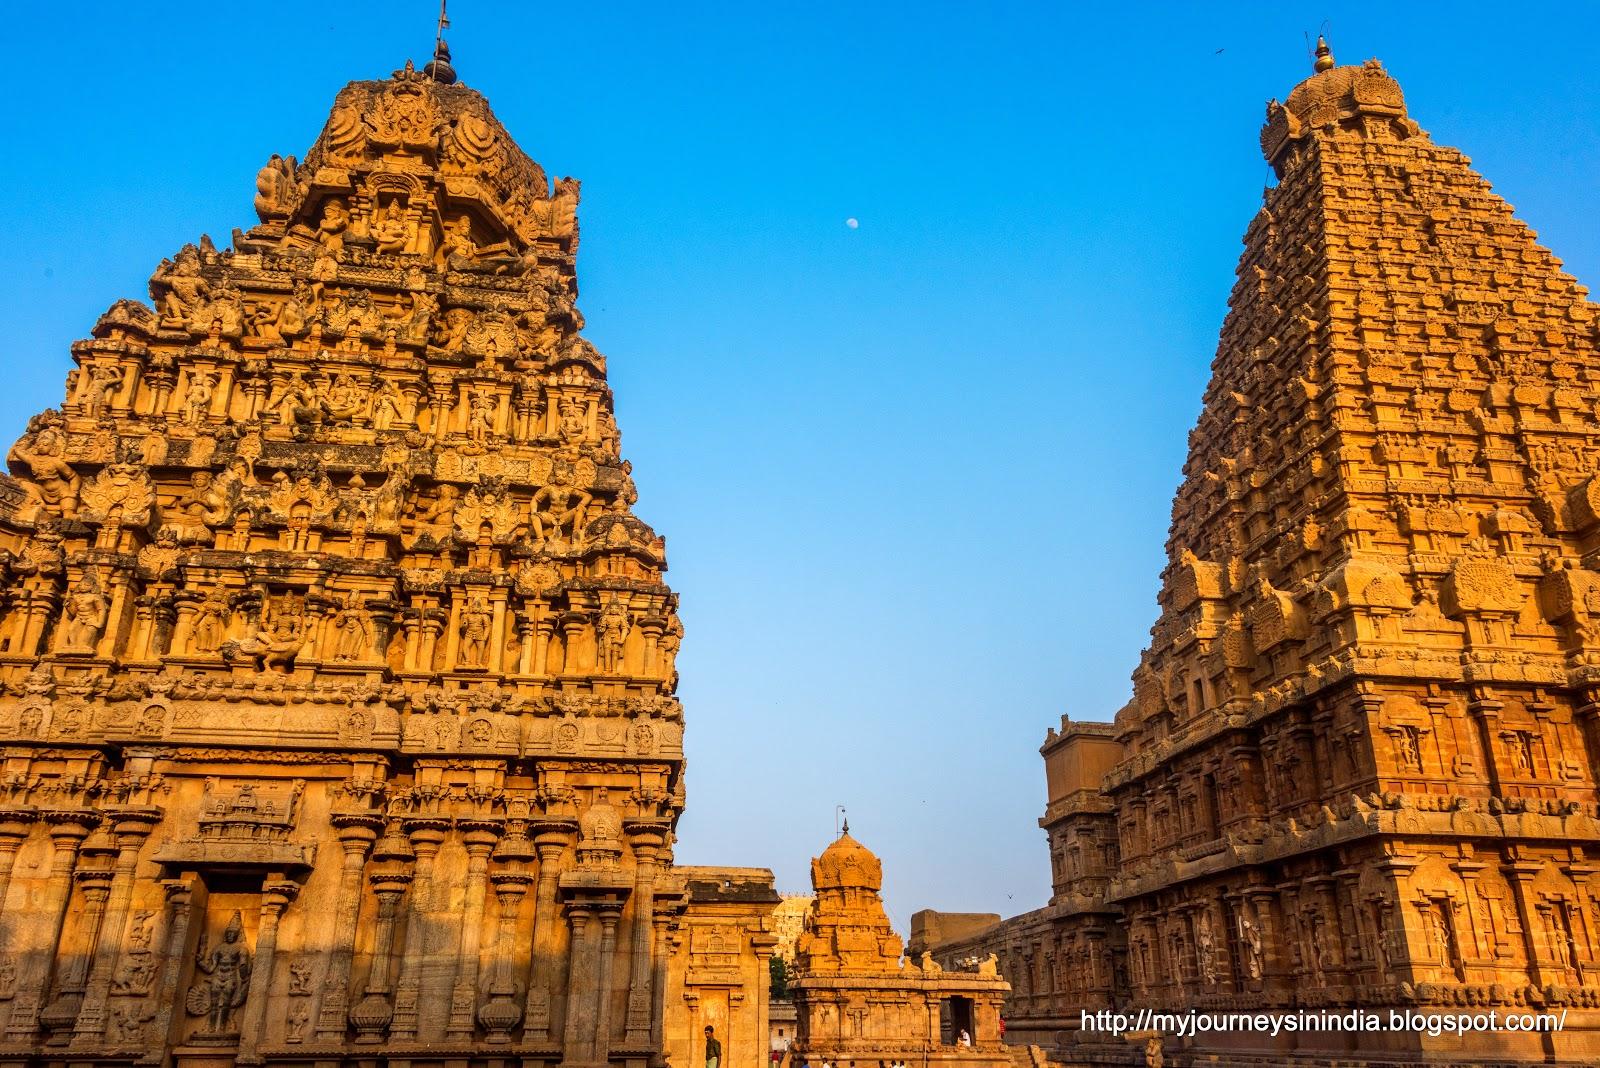 Thanjavur Brihadeeswarar Temple Twin Tower and Moon